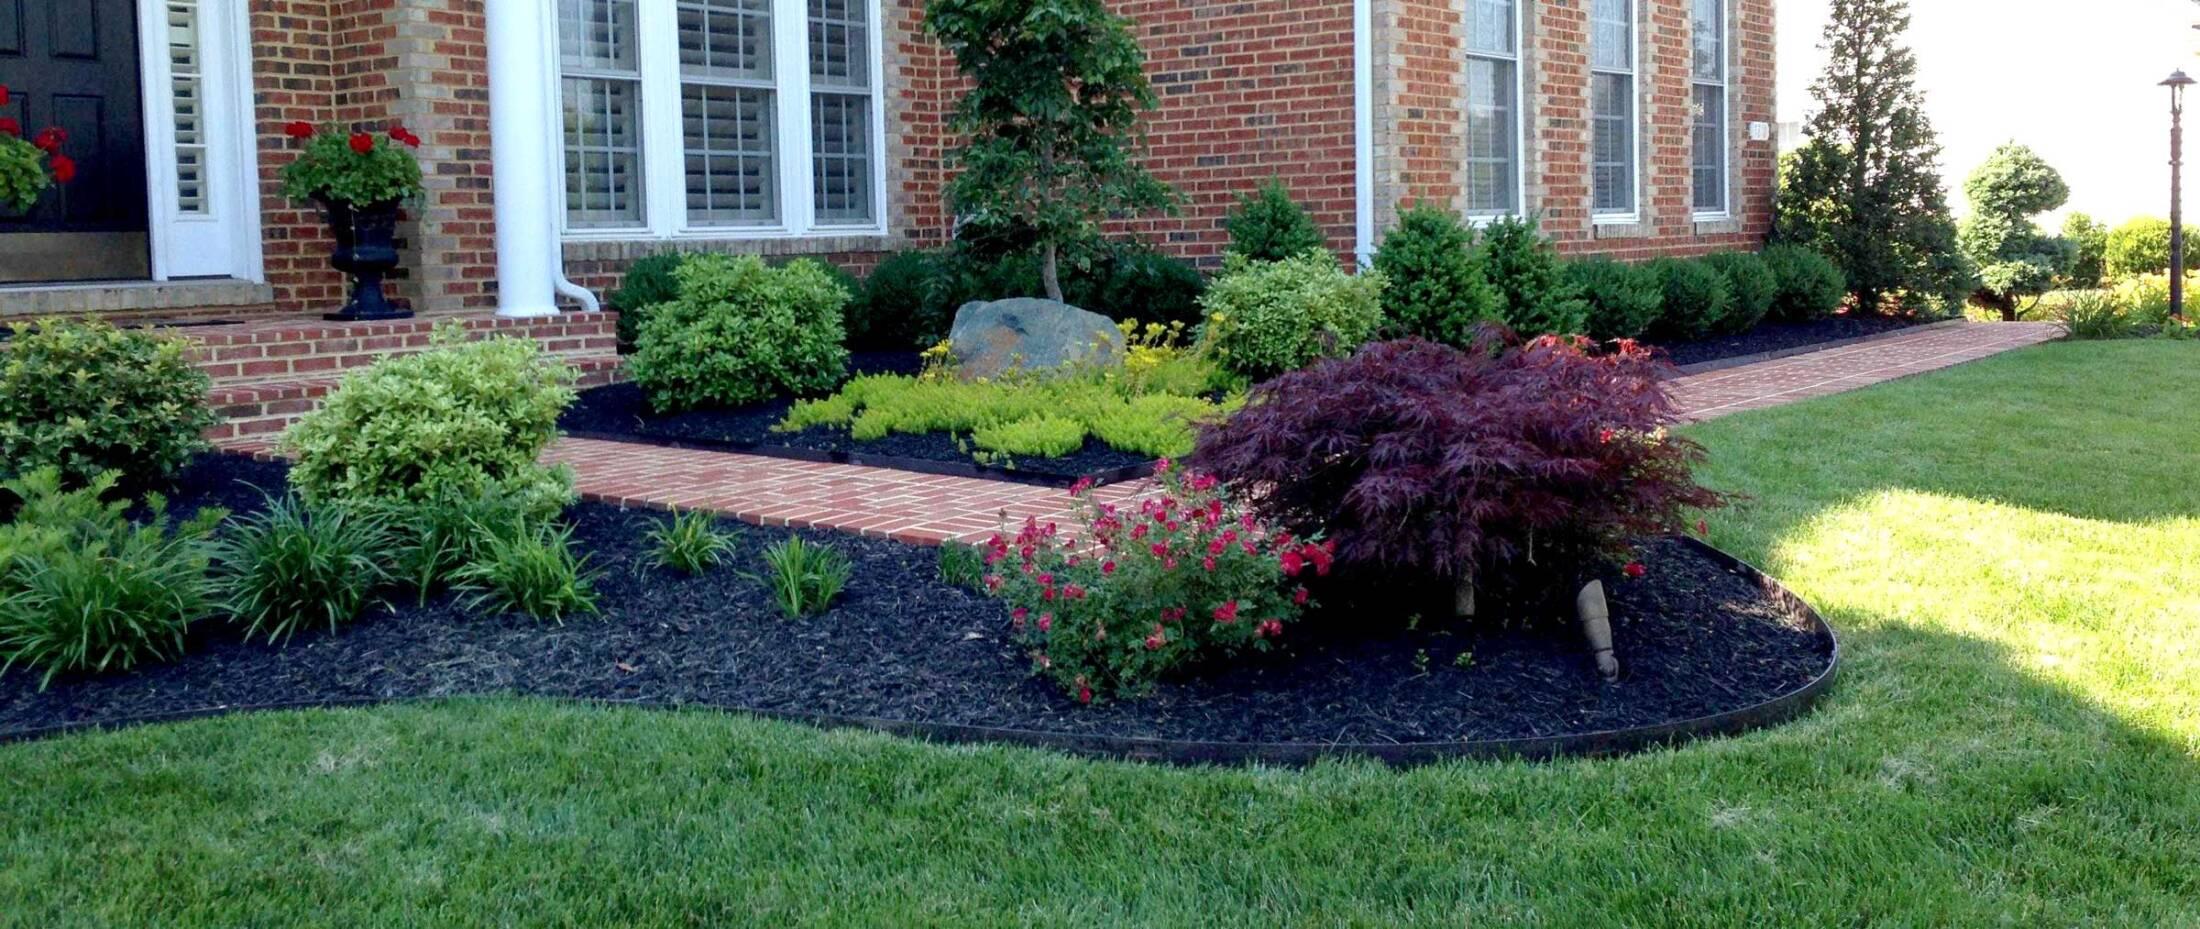 landscaping-brick-walkway-and-lighting